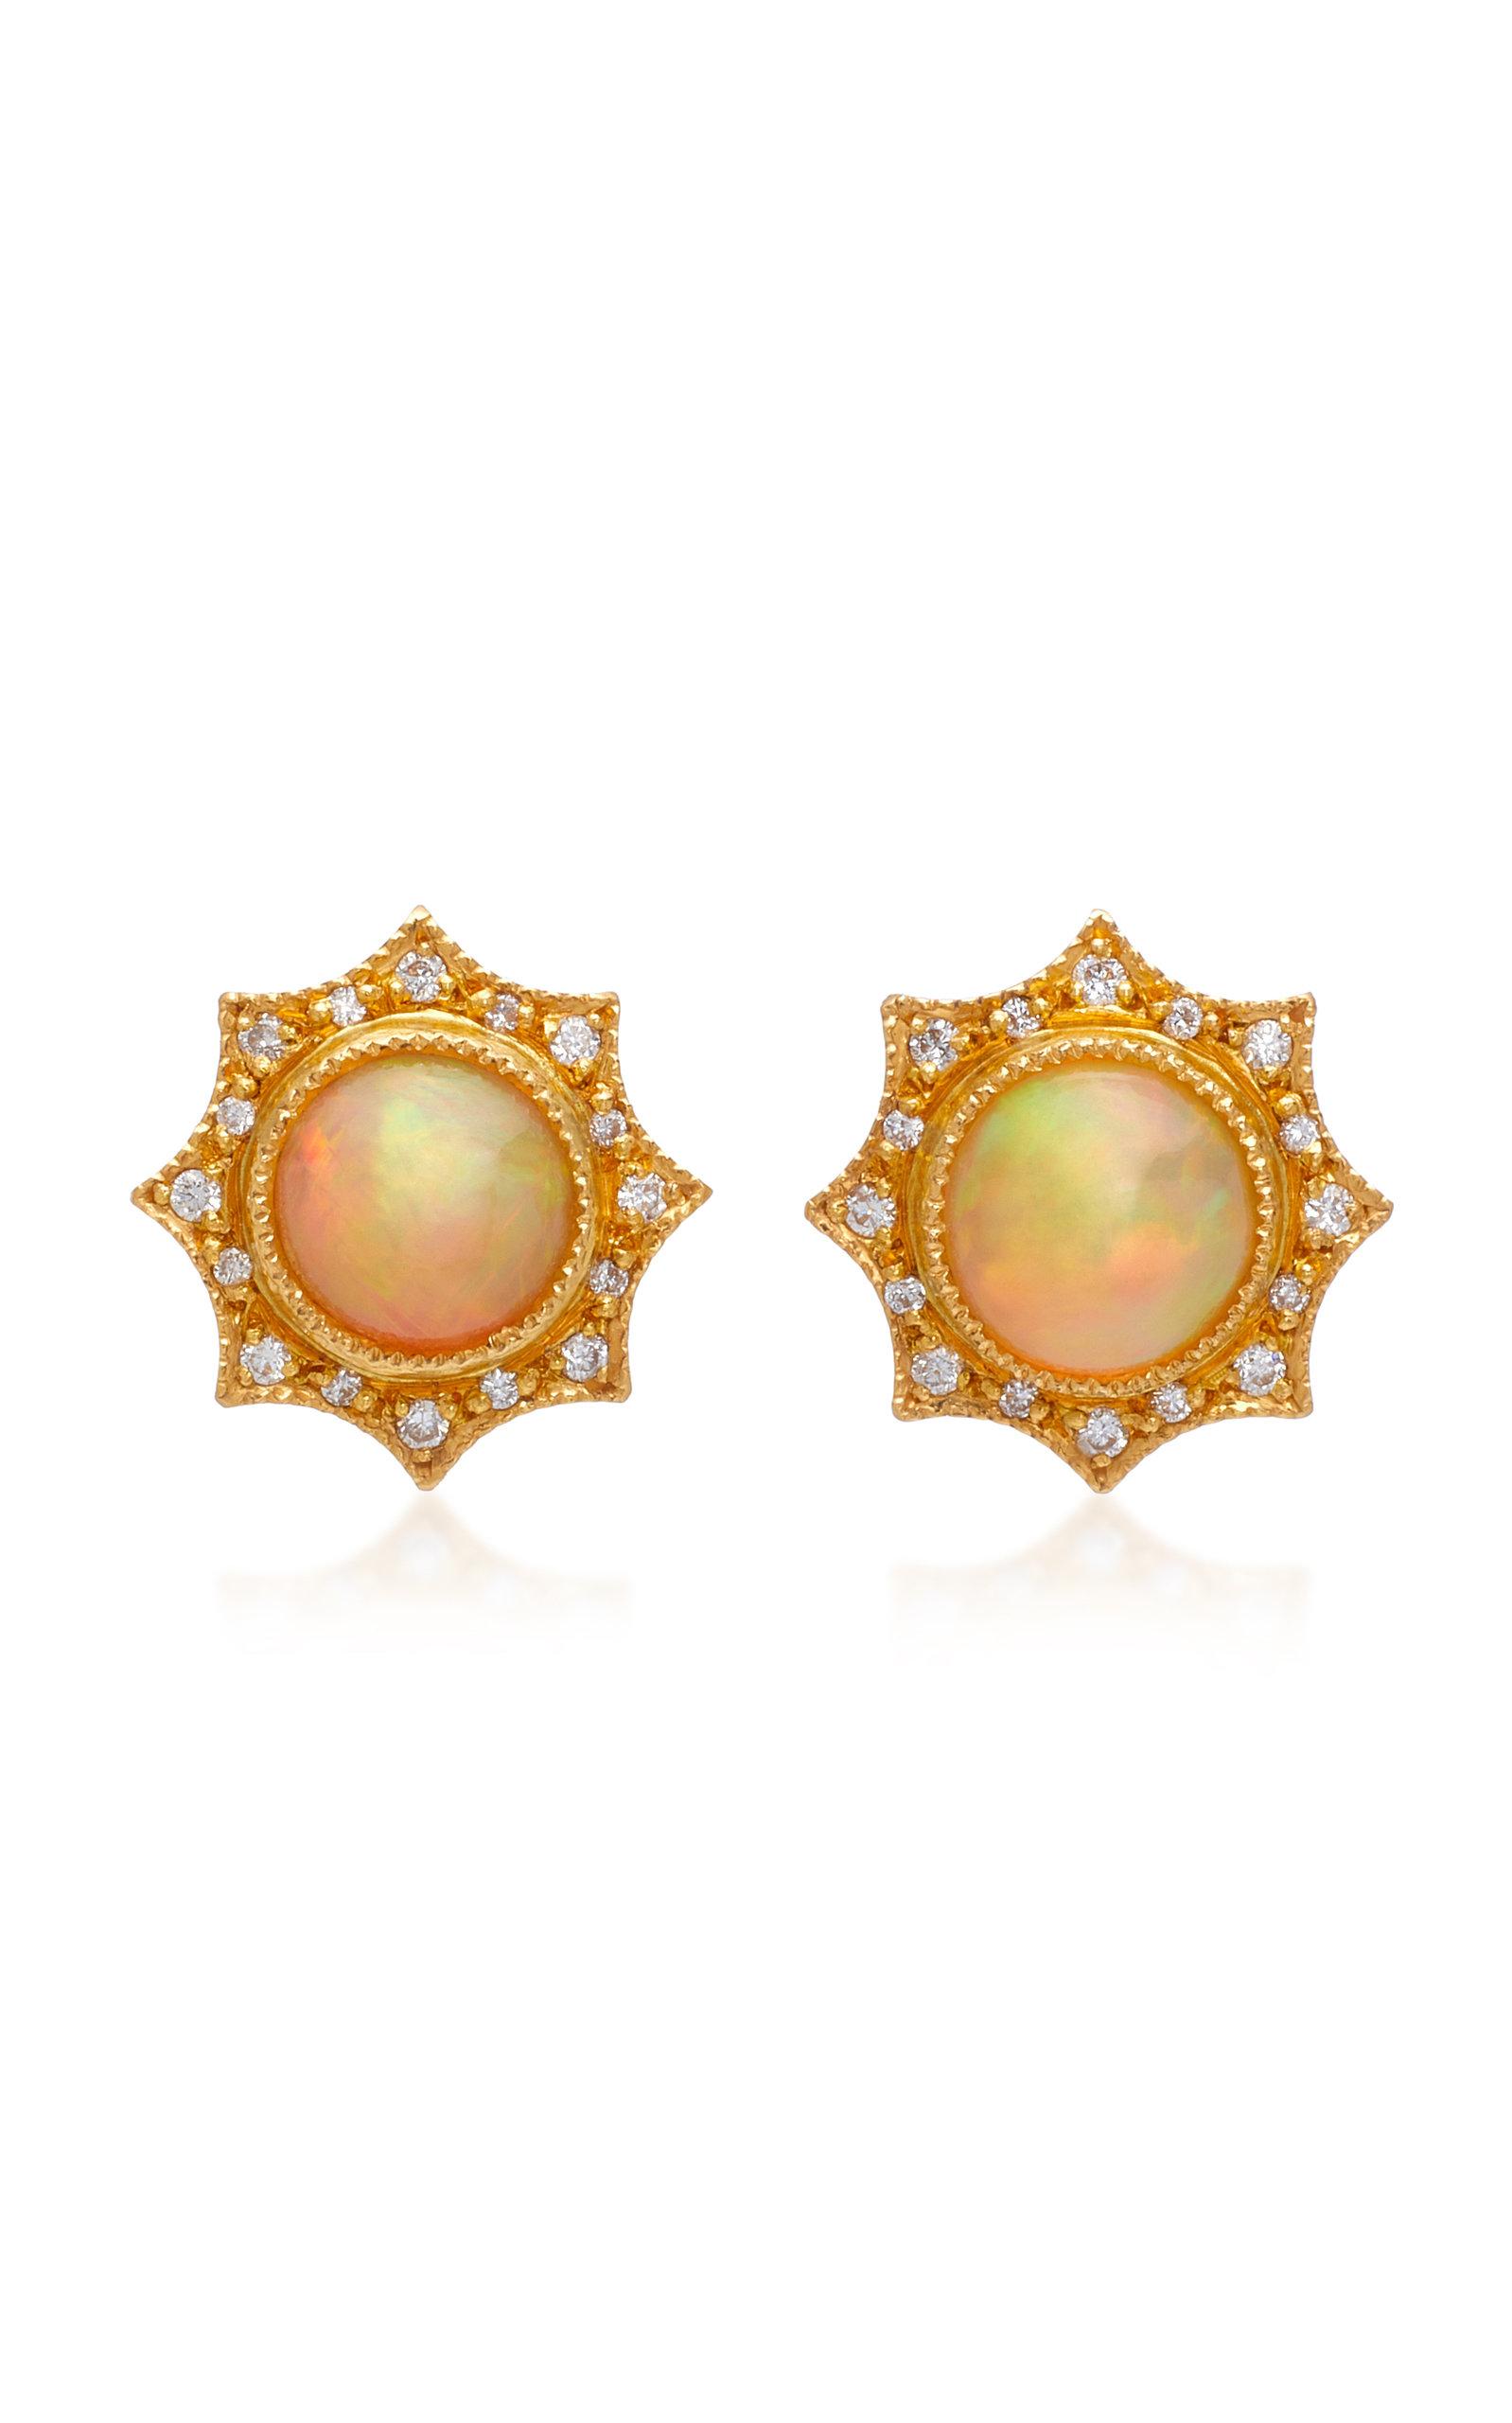 533f01c20 22K Gold, Opal And Diamond Stud Earrings by Arman Sarkisyan | Moda ...